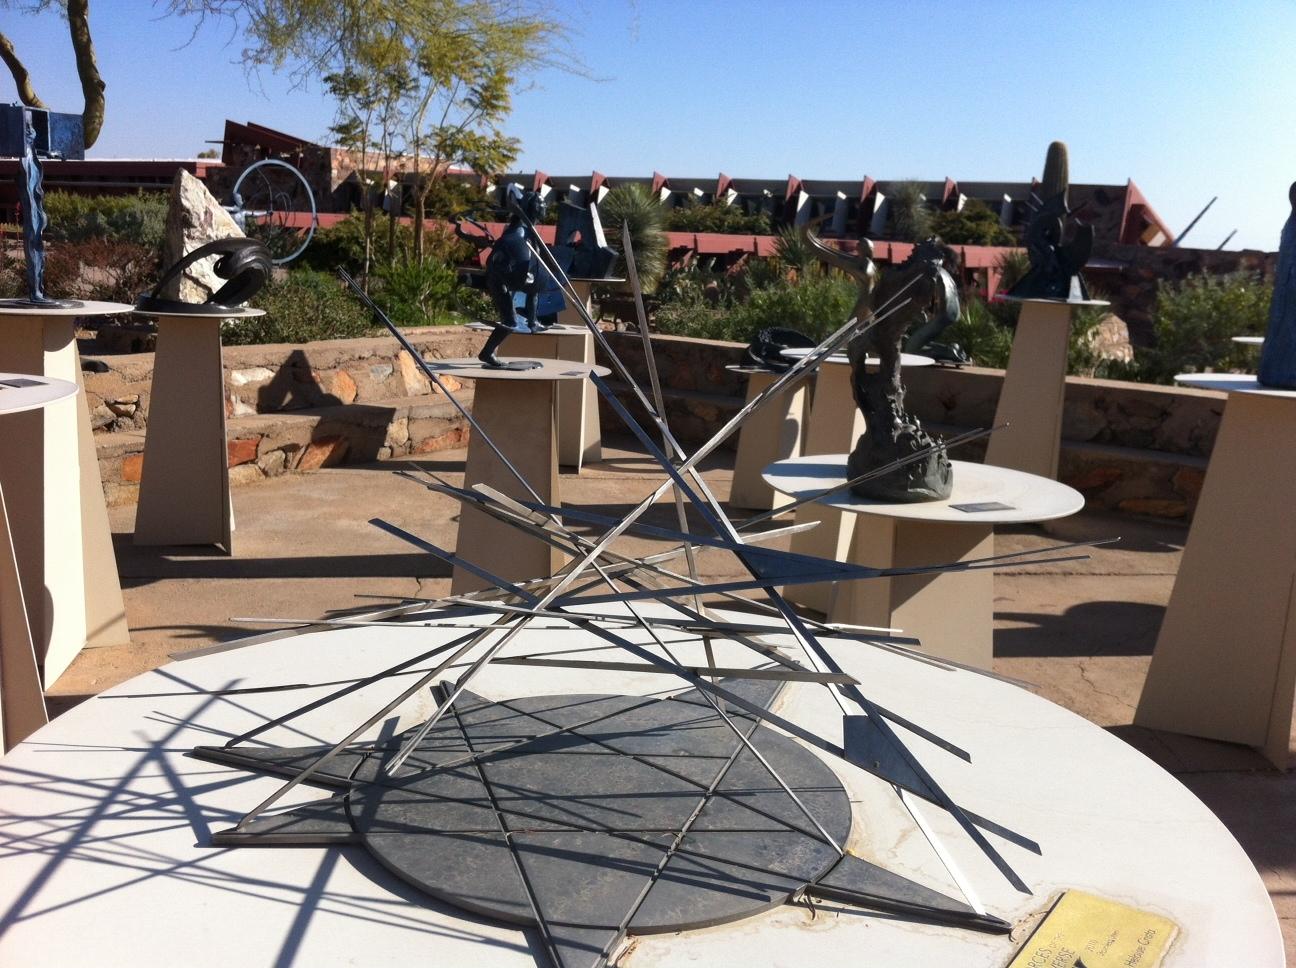 Heloise Crista's sculpture garden.